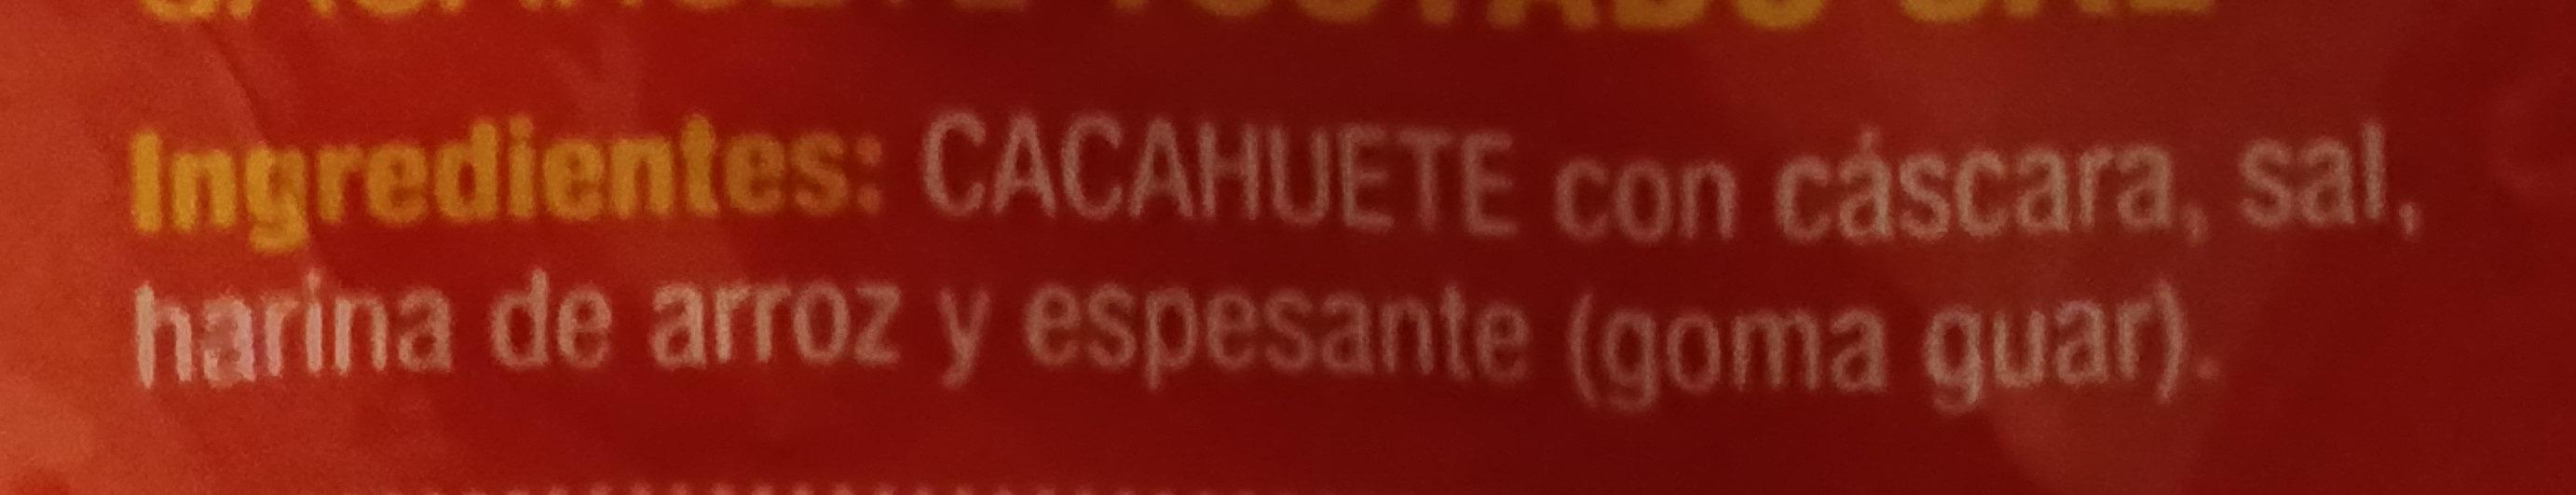 Cacahuete tostado sal - Ingredientes